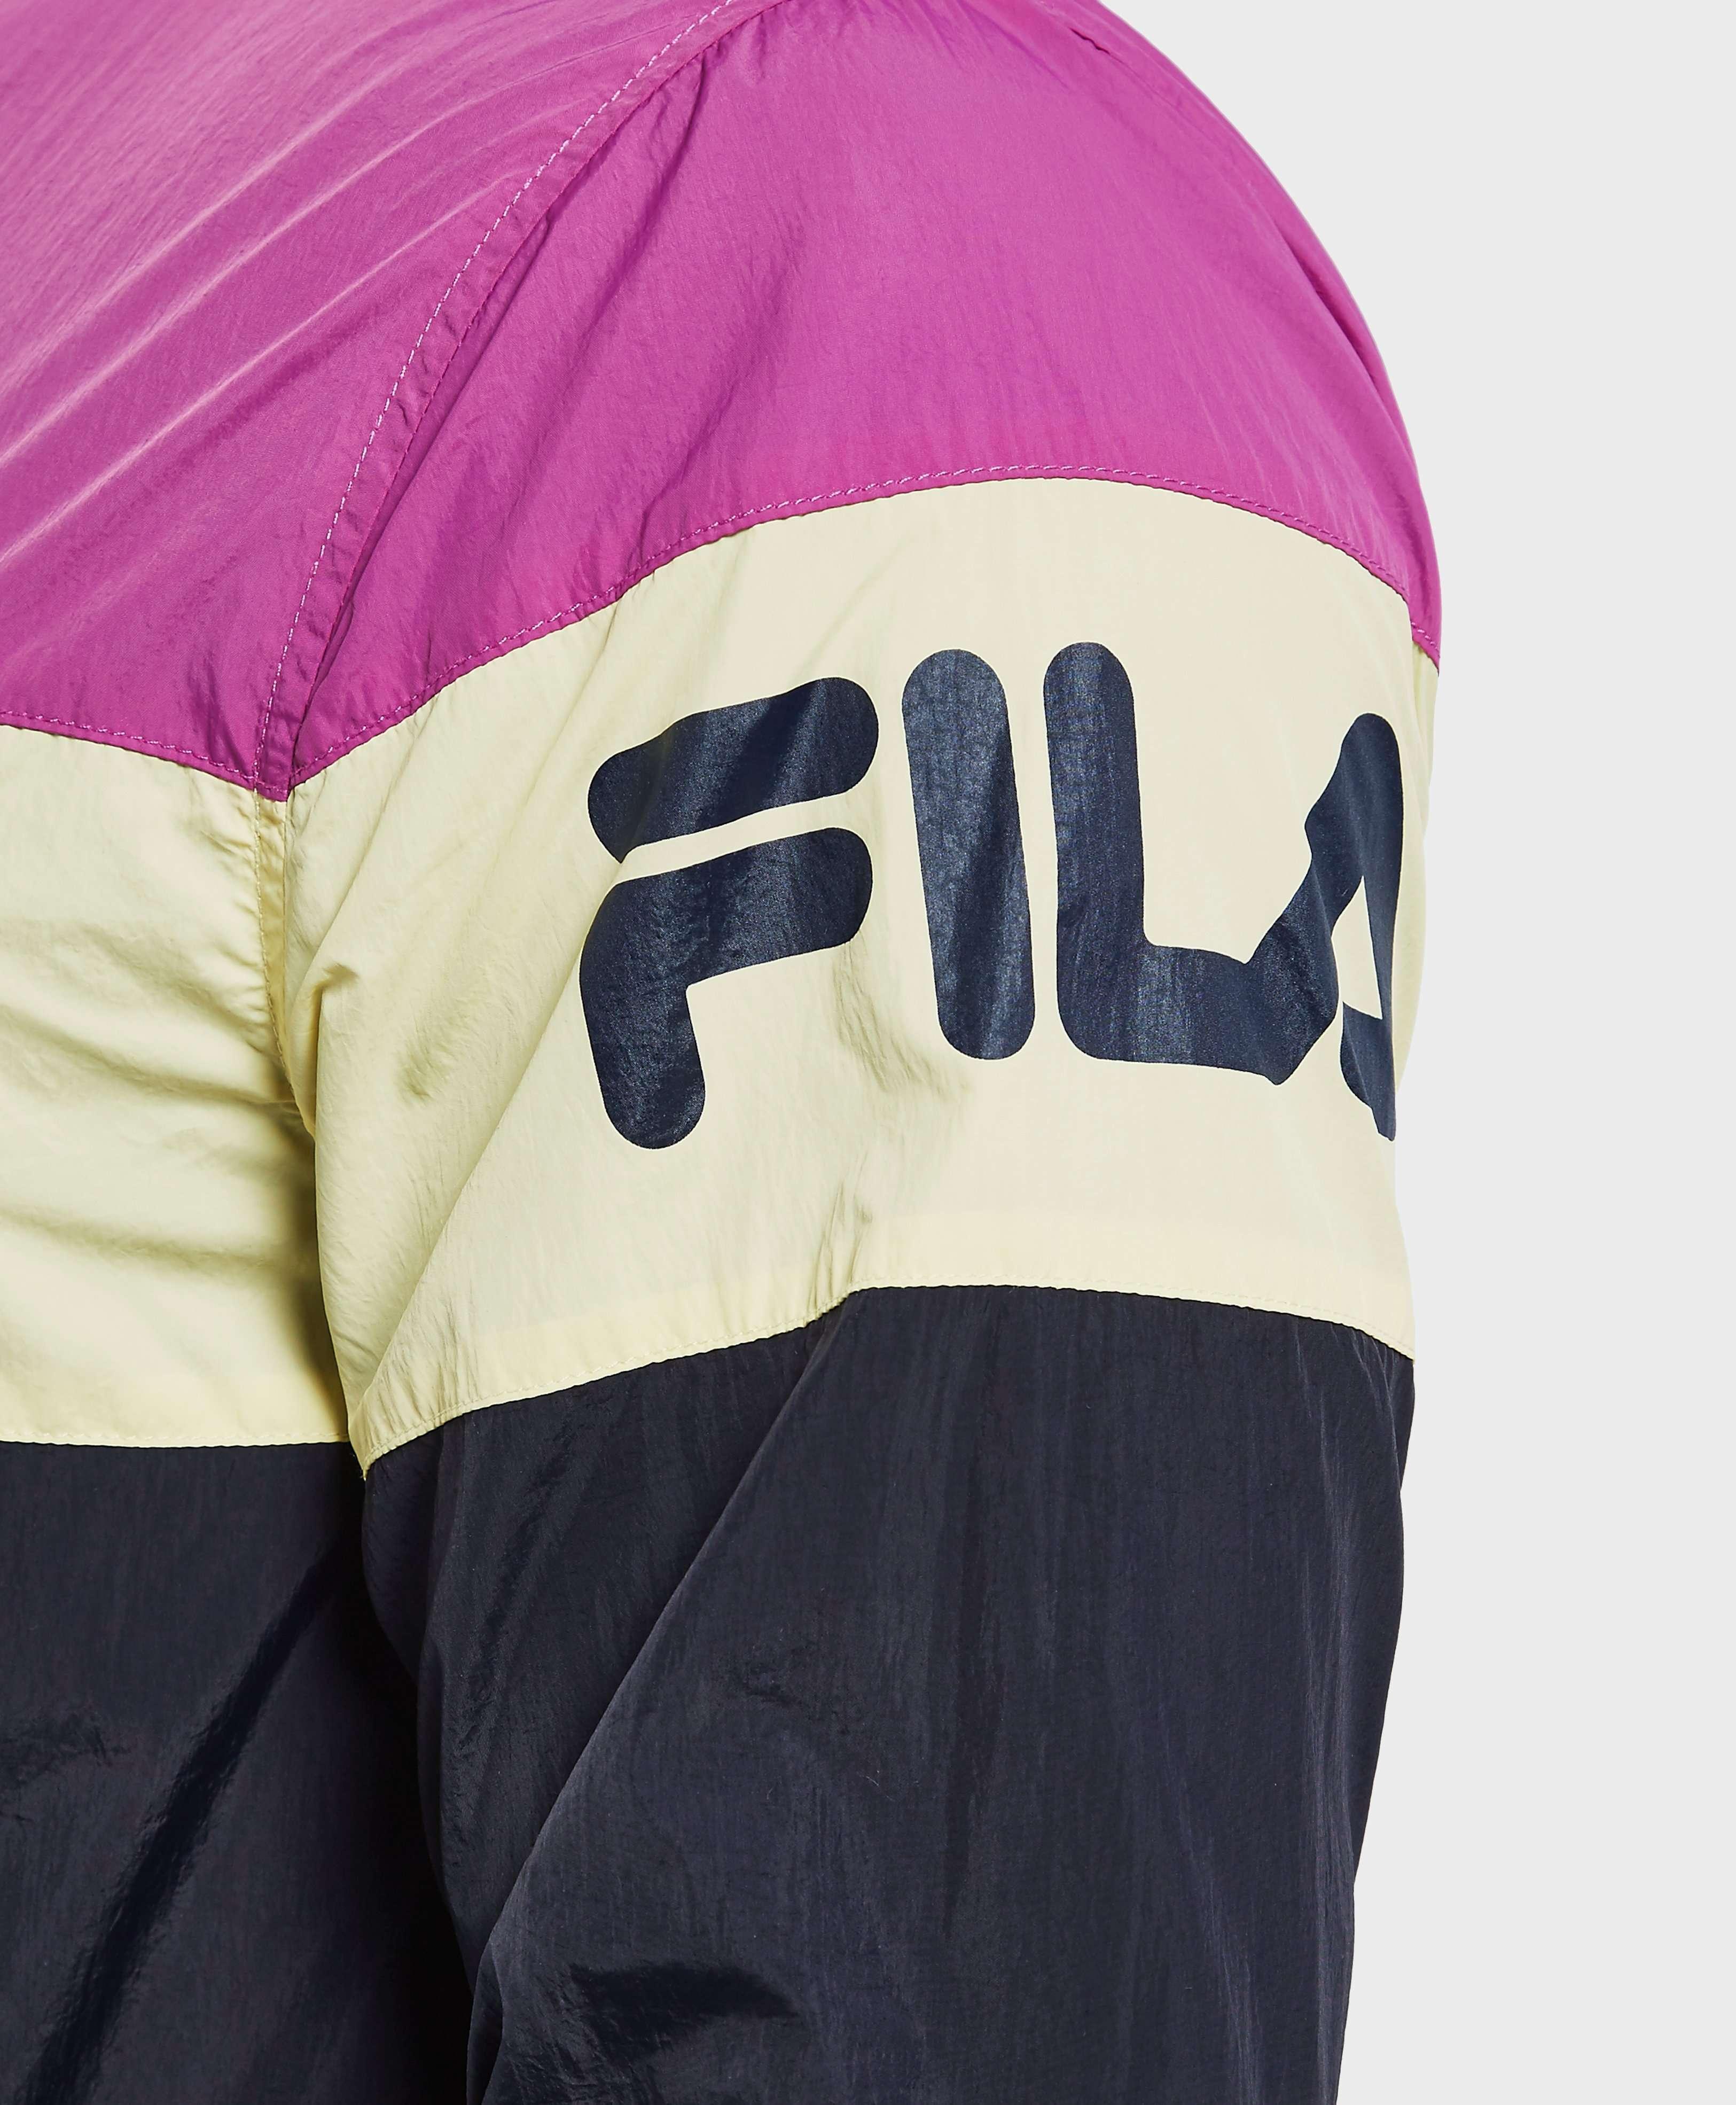 Fila Arutas Full Zip Track Top - Exclusive